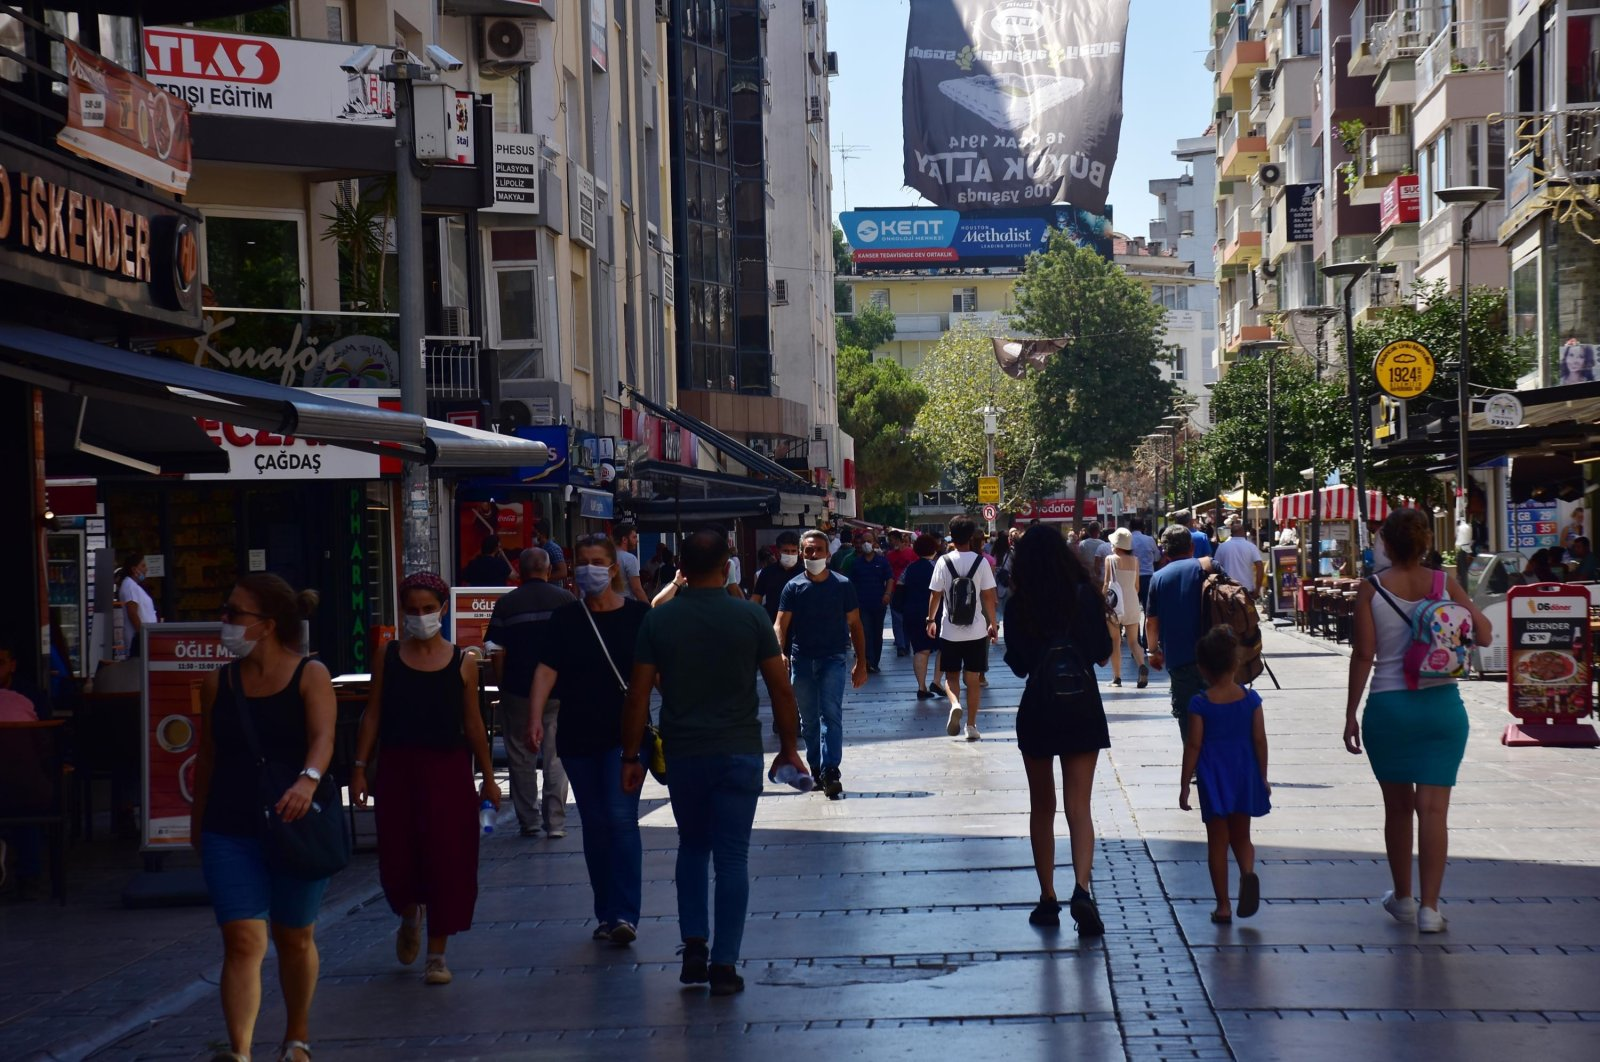 People walking down a street in Izmir, Aug 12, 2020. (DHA Photo)